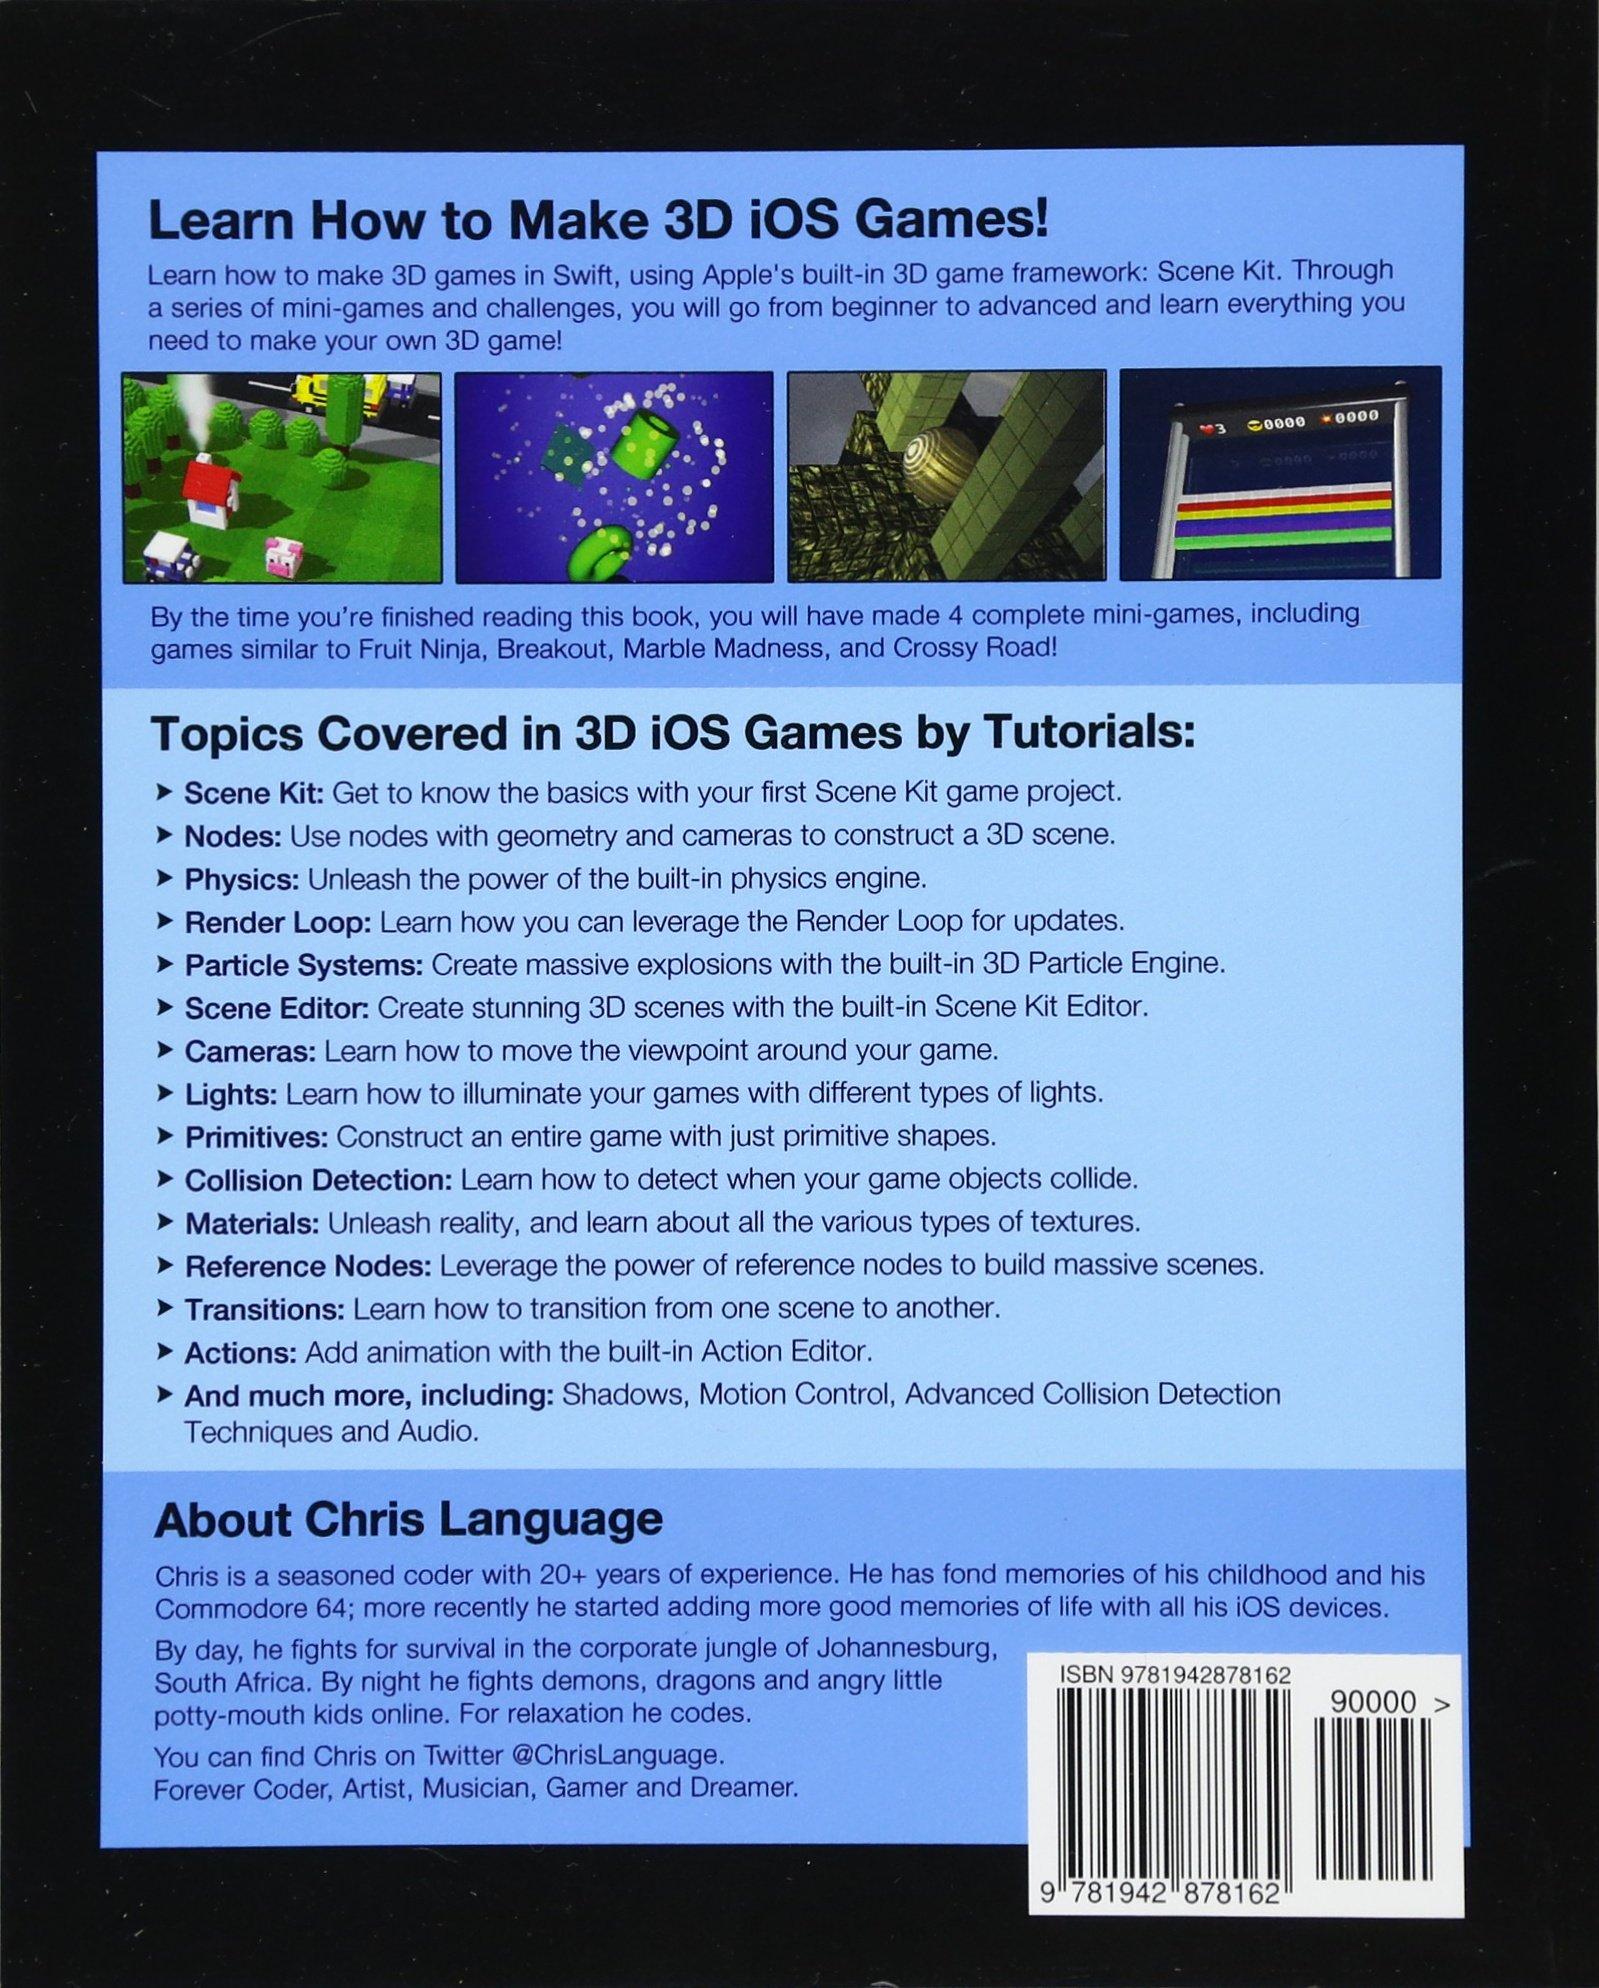 3D iOS Games by Tutorials: Beginning 3D iOS Game Development